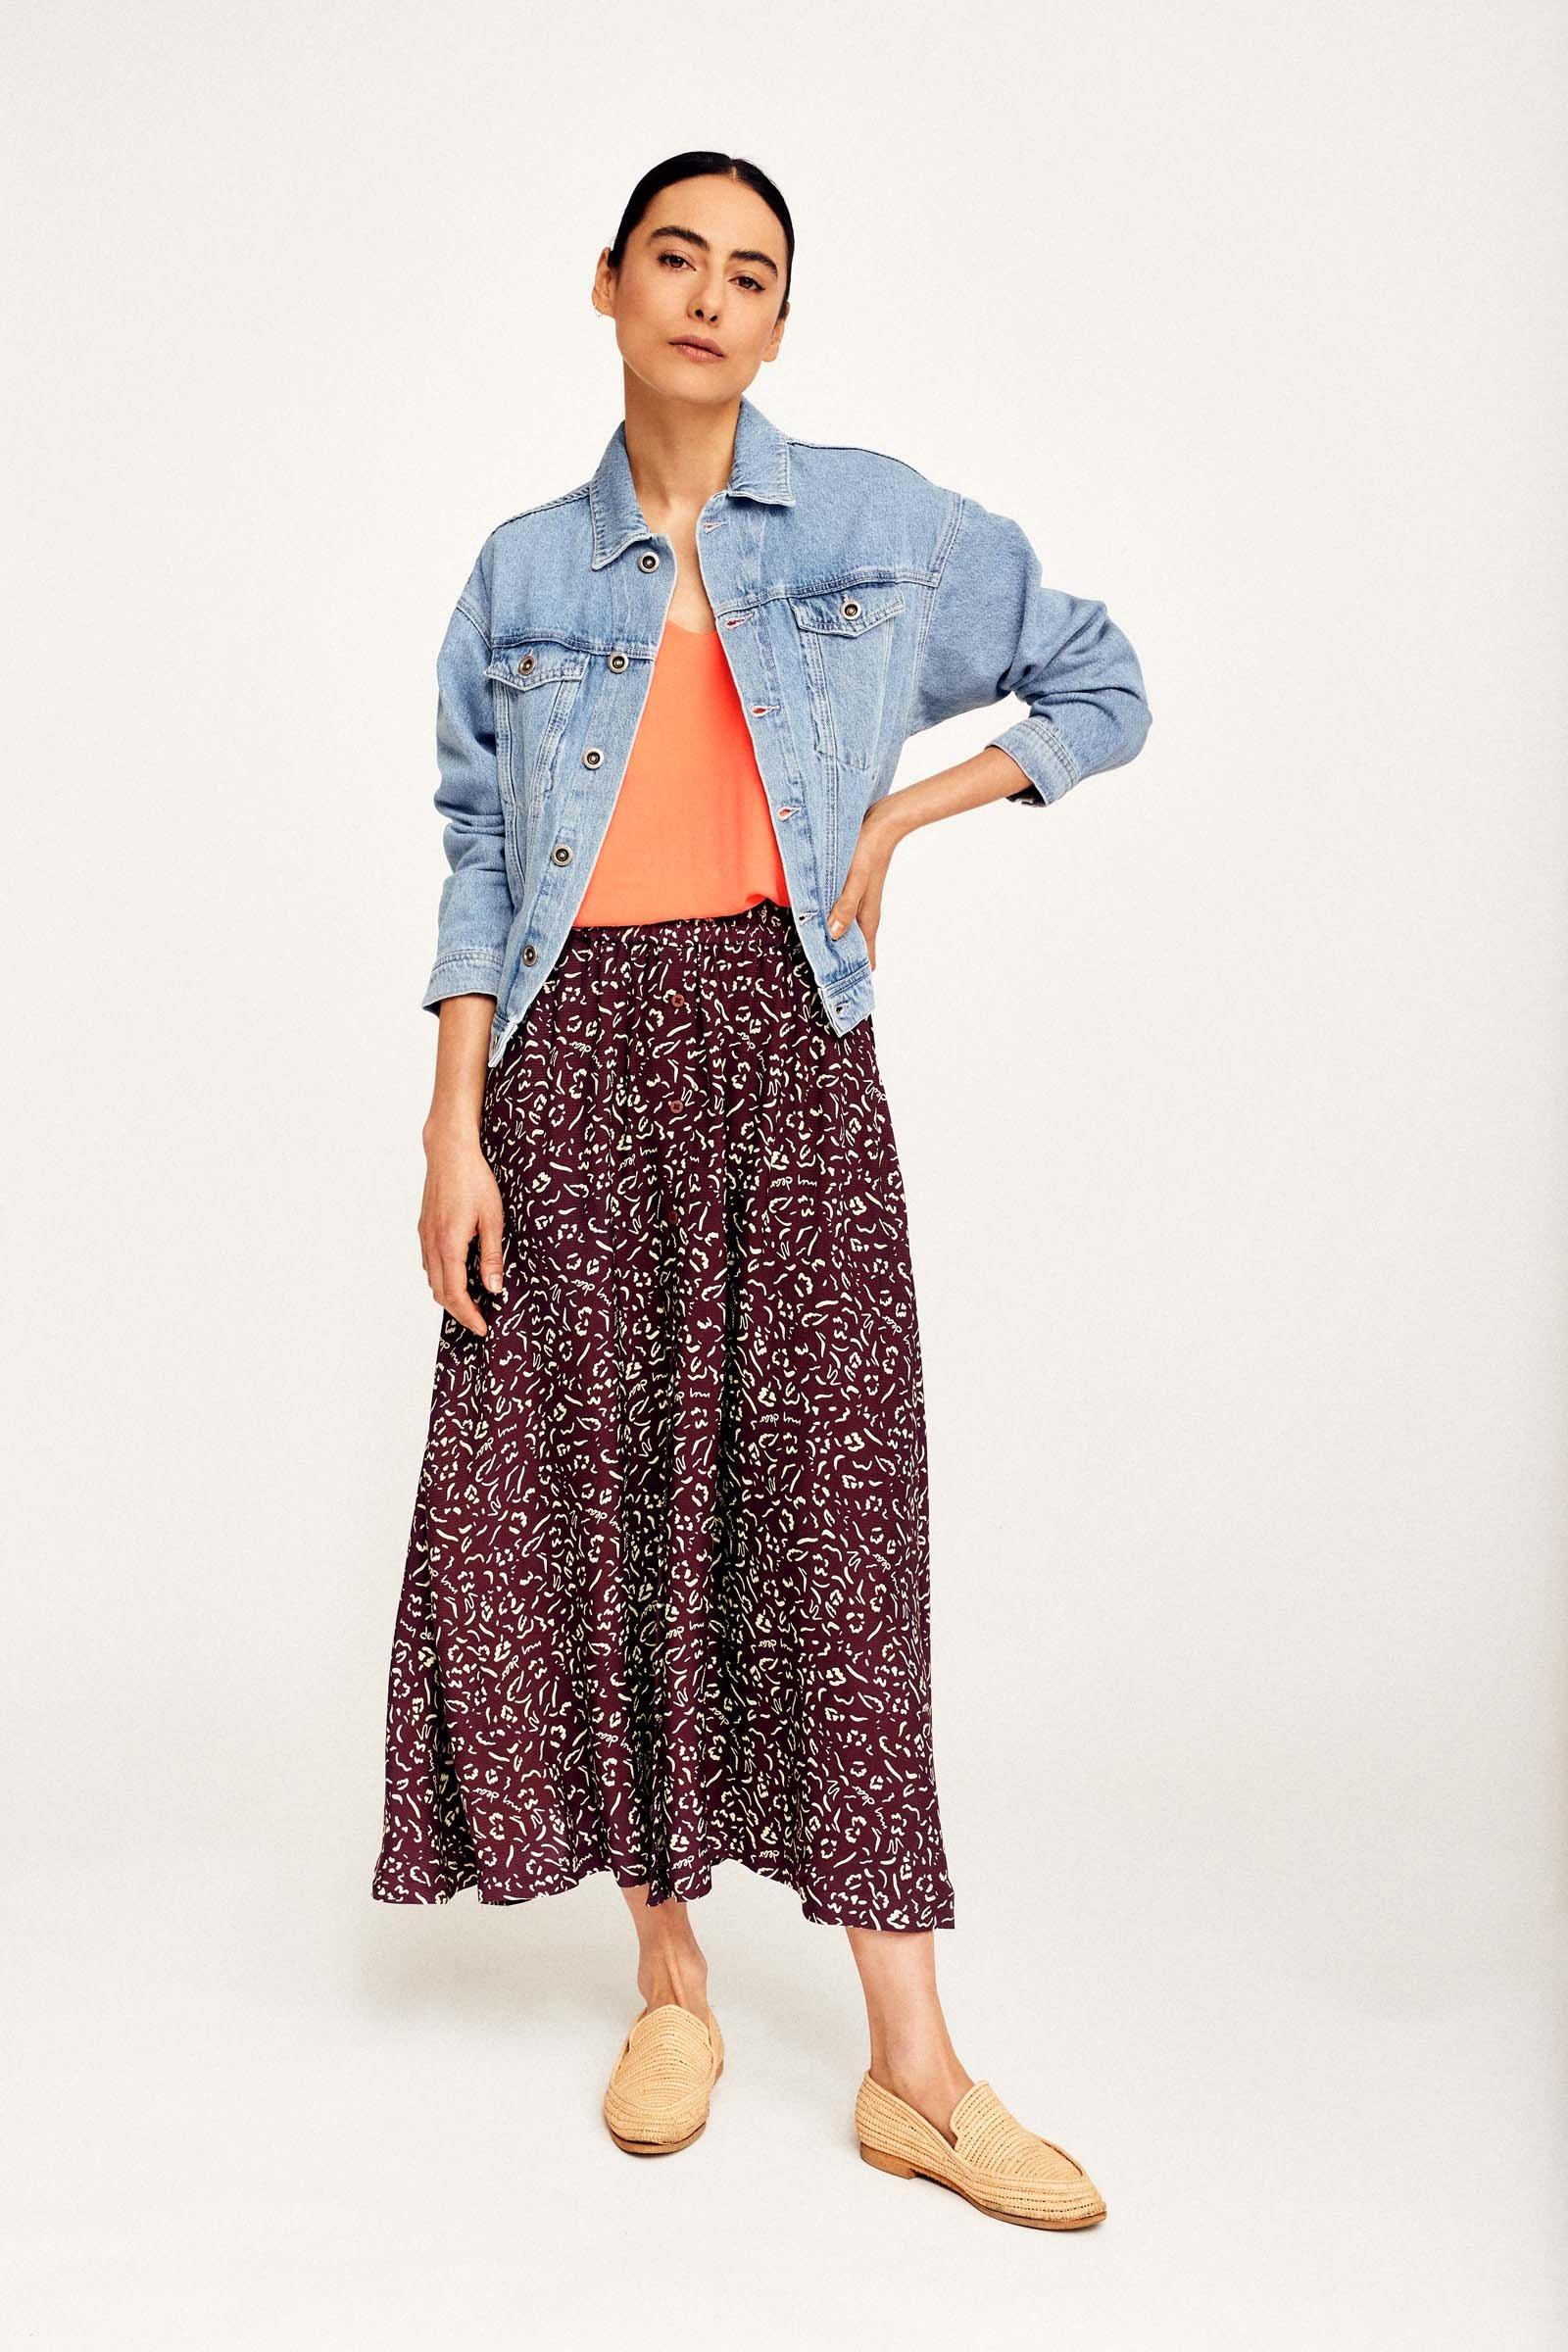 https://webmedia.cks-fashion.com/i/cks/123254ASM_30_f_model